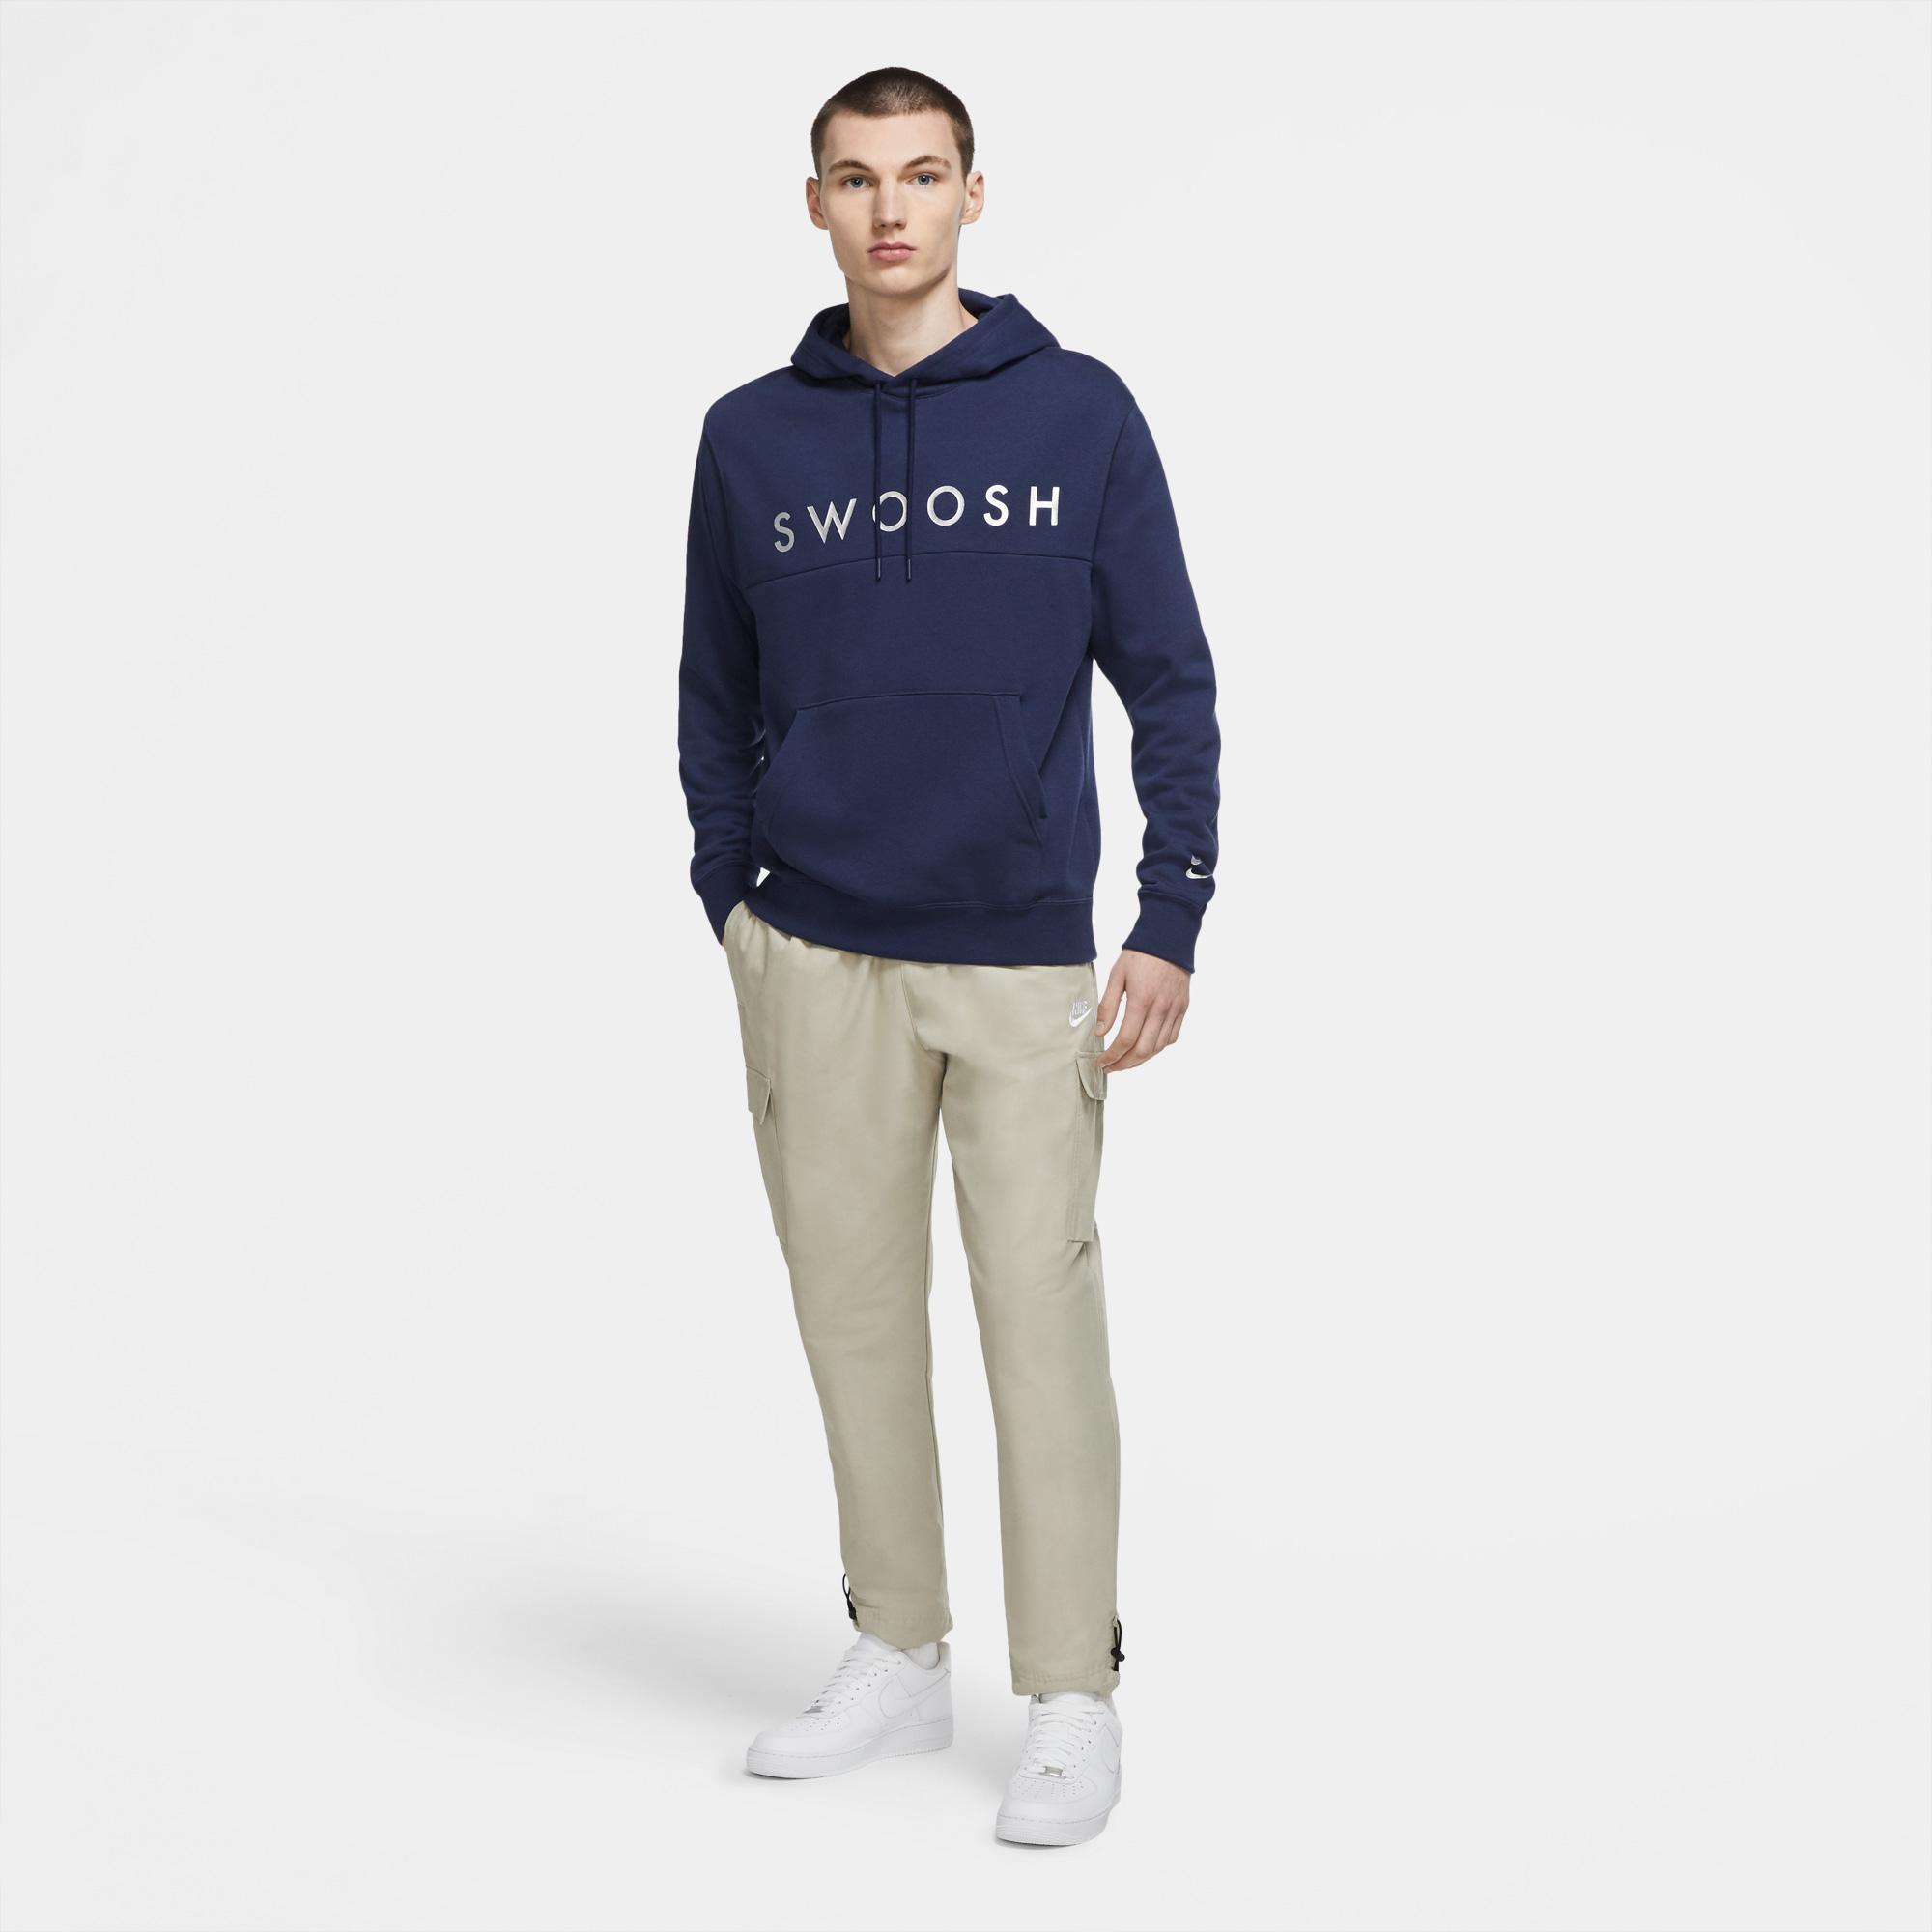 Nike Sportswear Swoosh Erkek Lacivert Sweatshirt